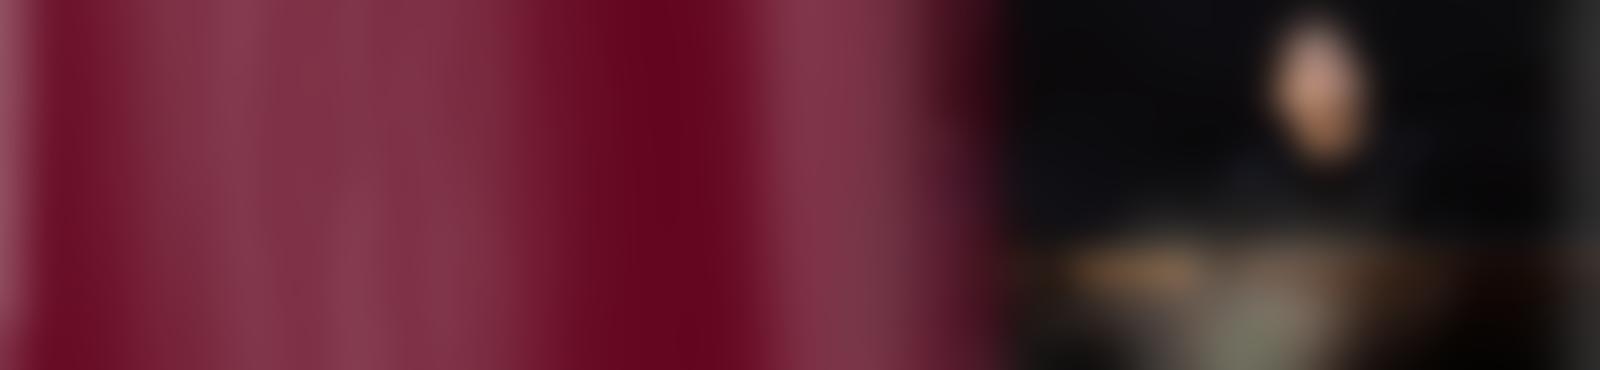 Blurred 78dce6fe 7933 40f2 ba7b 270e7f649c20